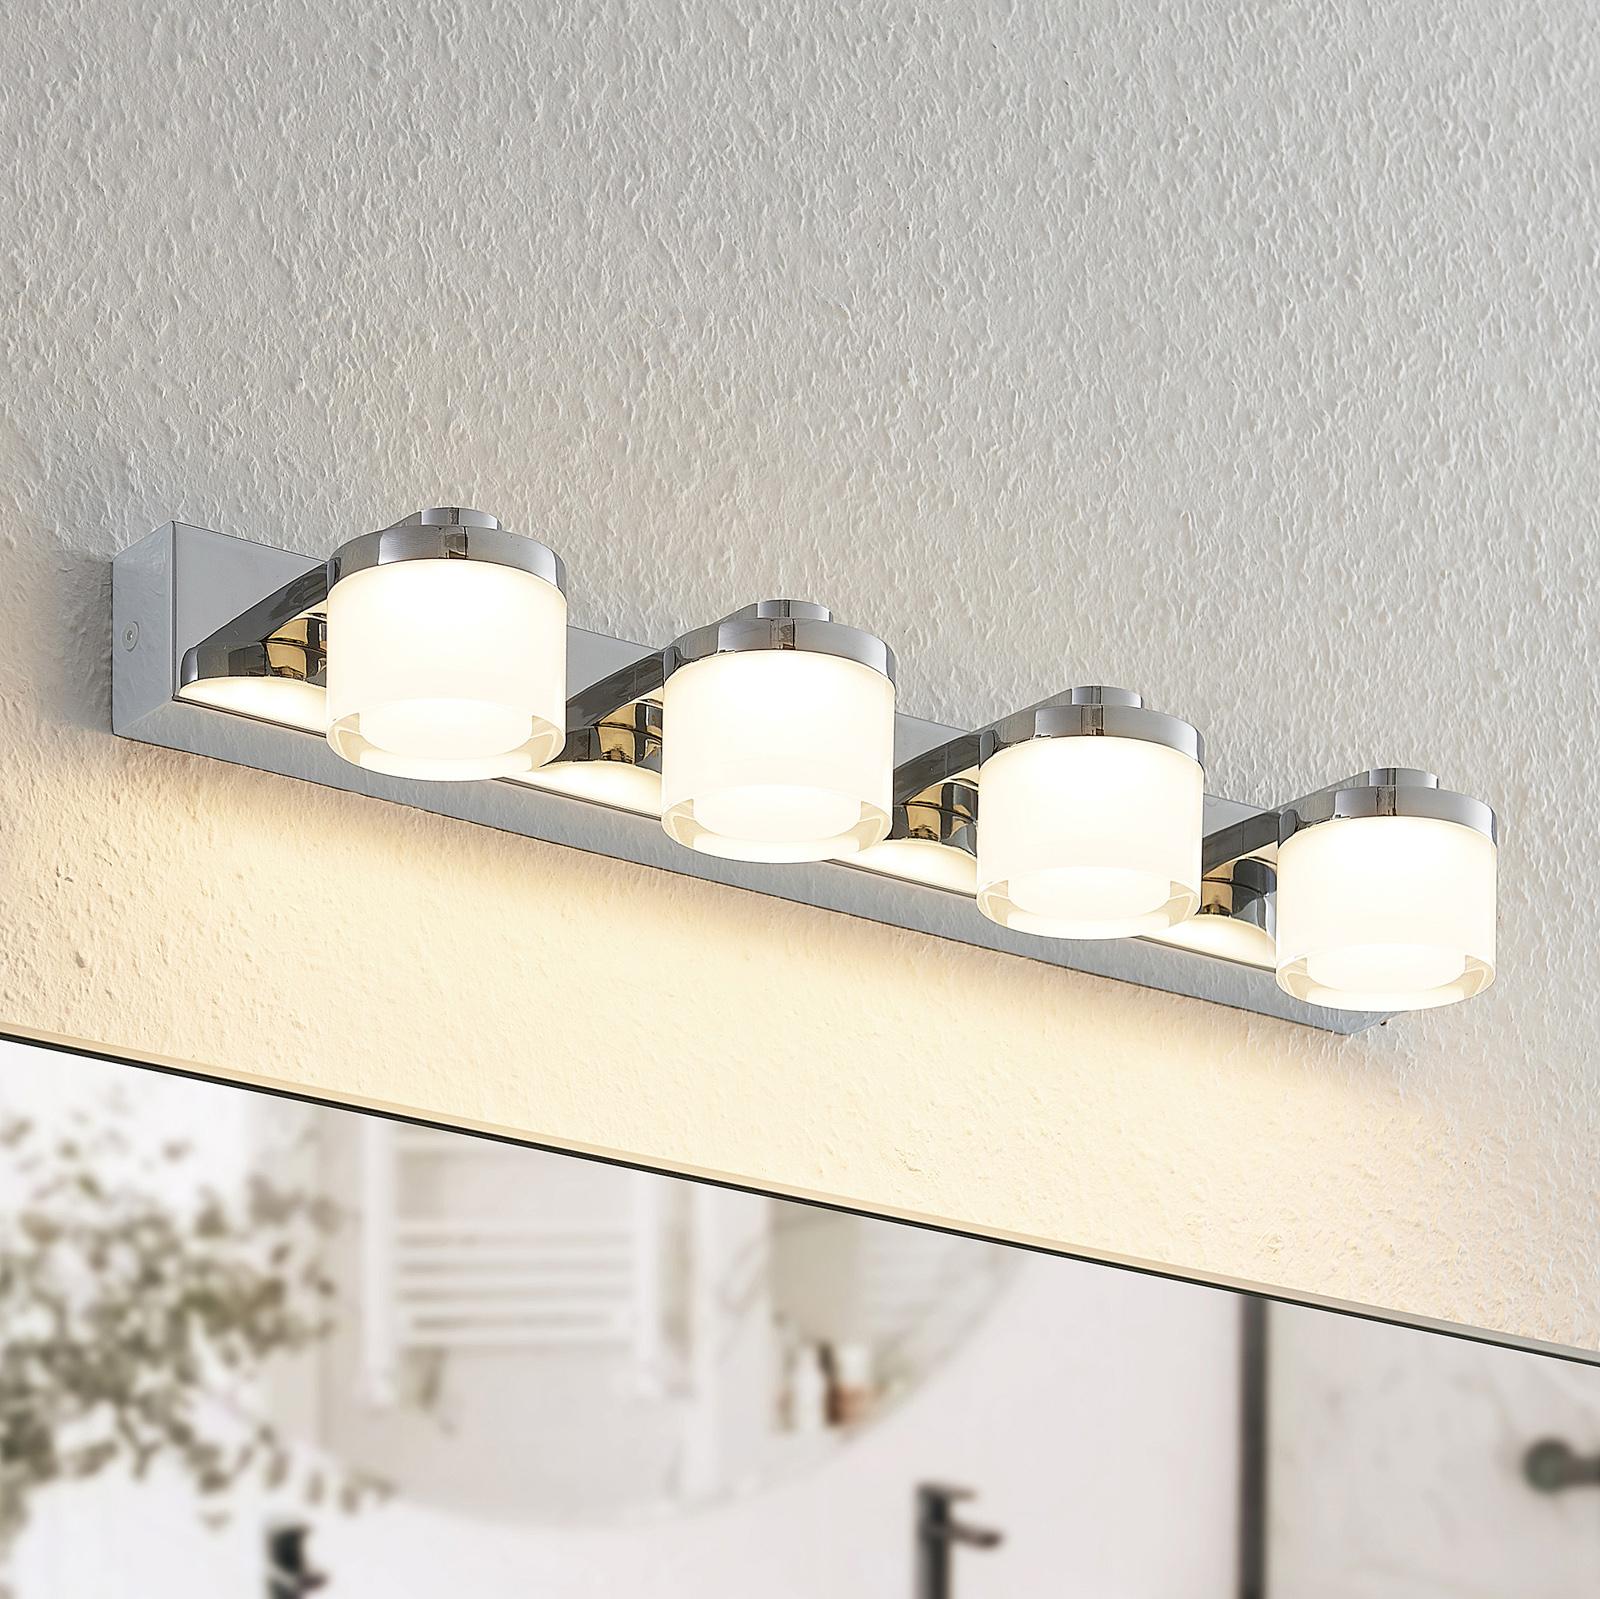 Arcchio Kejan LED-vägglampa IP44 4 lampor